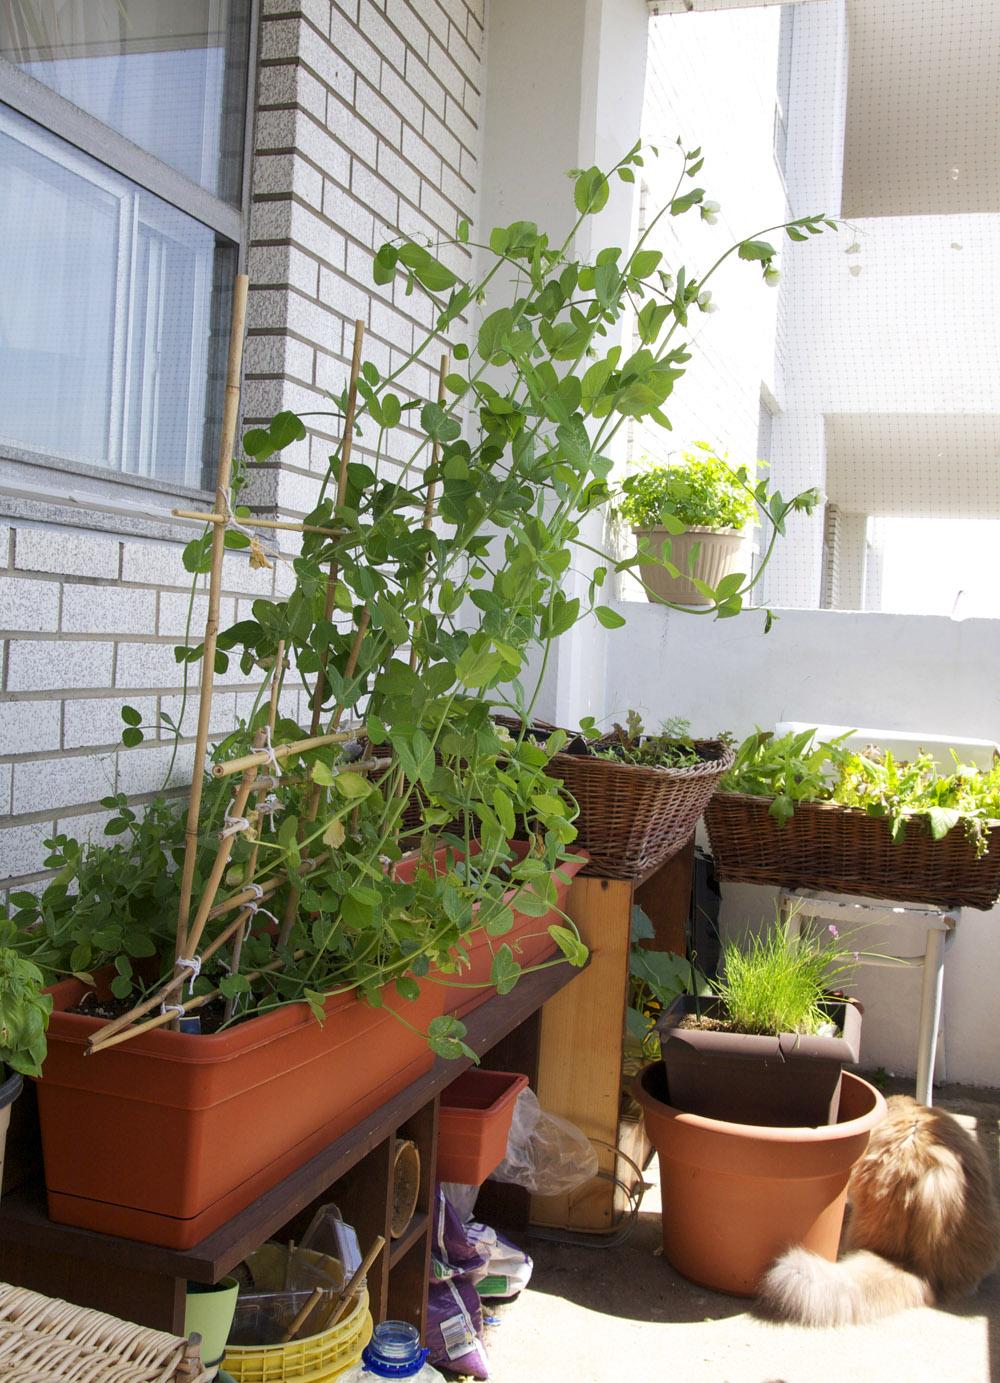 Toronto Balcony Gardening: Hand-made Bamboo Trellis Still ...